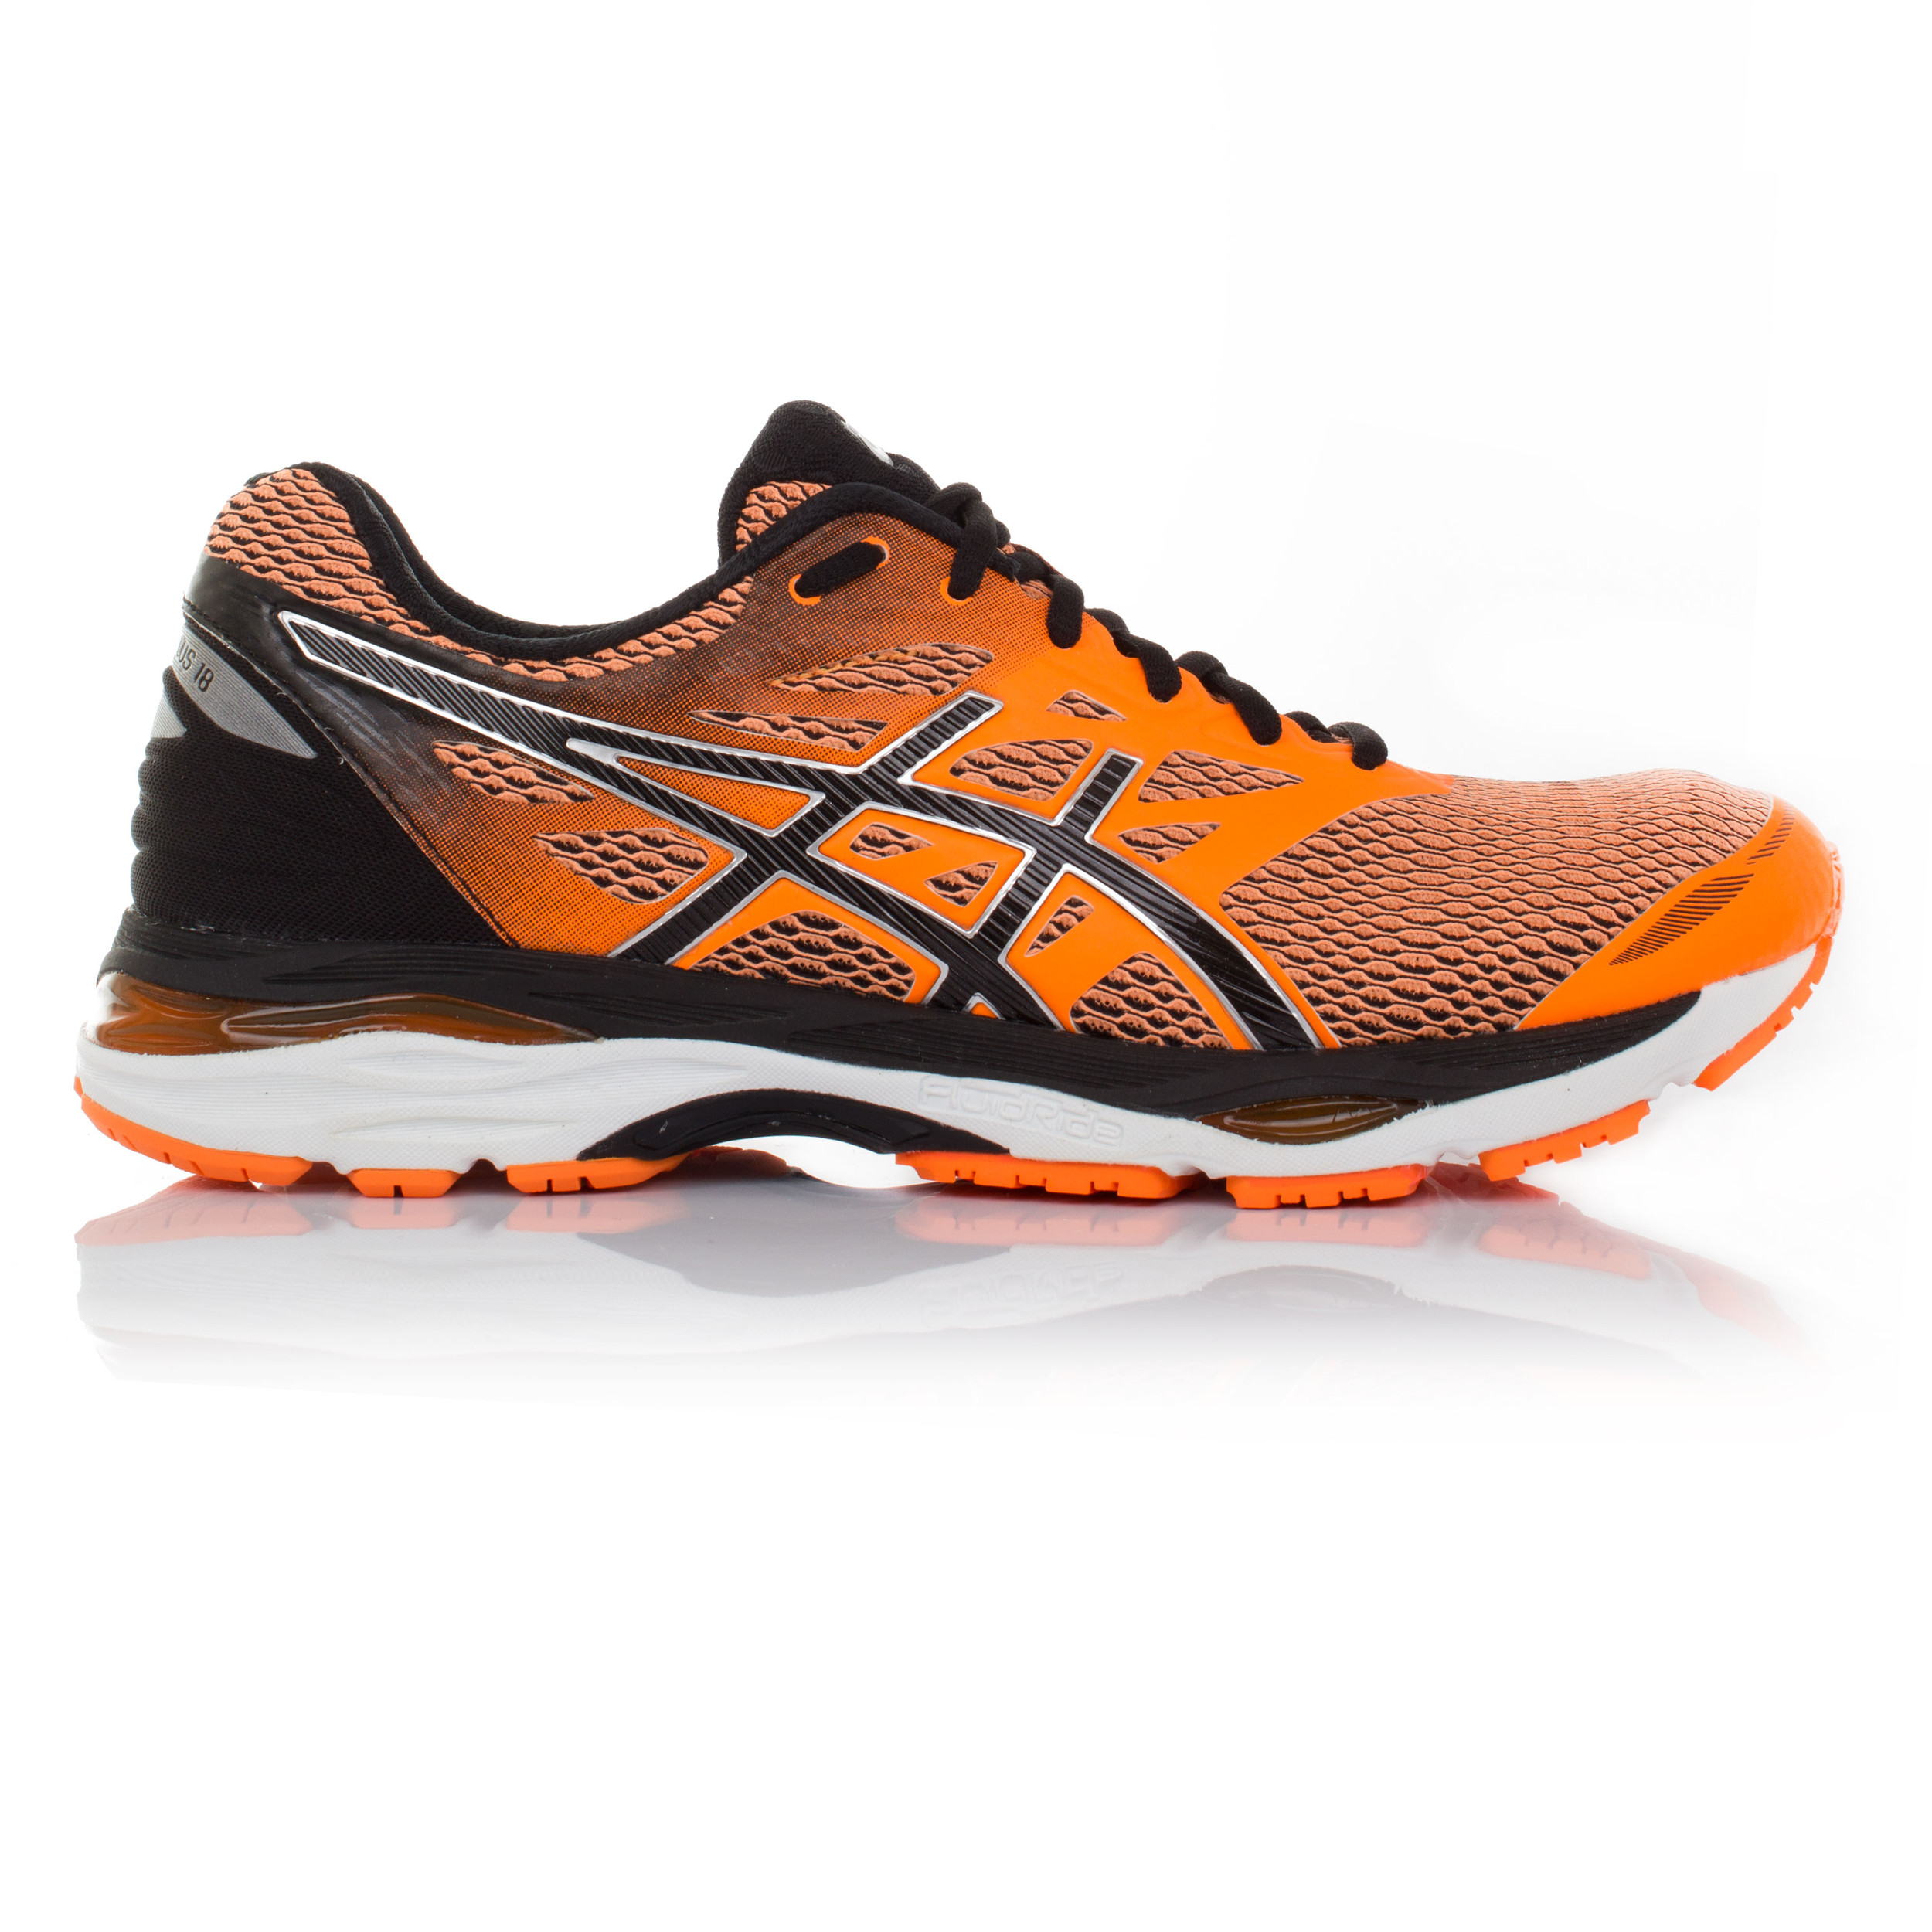 Detalles de Asics Gel Cumulus 18 Hombre Naranja Acolchado Running Camino Zapatos Zapatillas